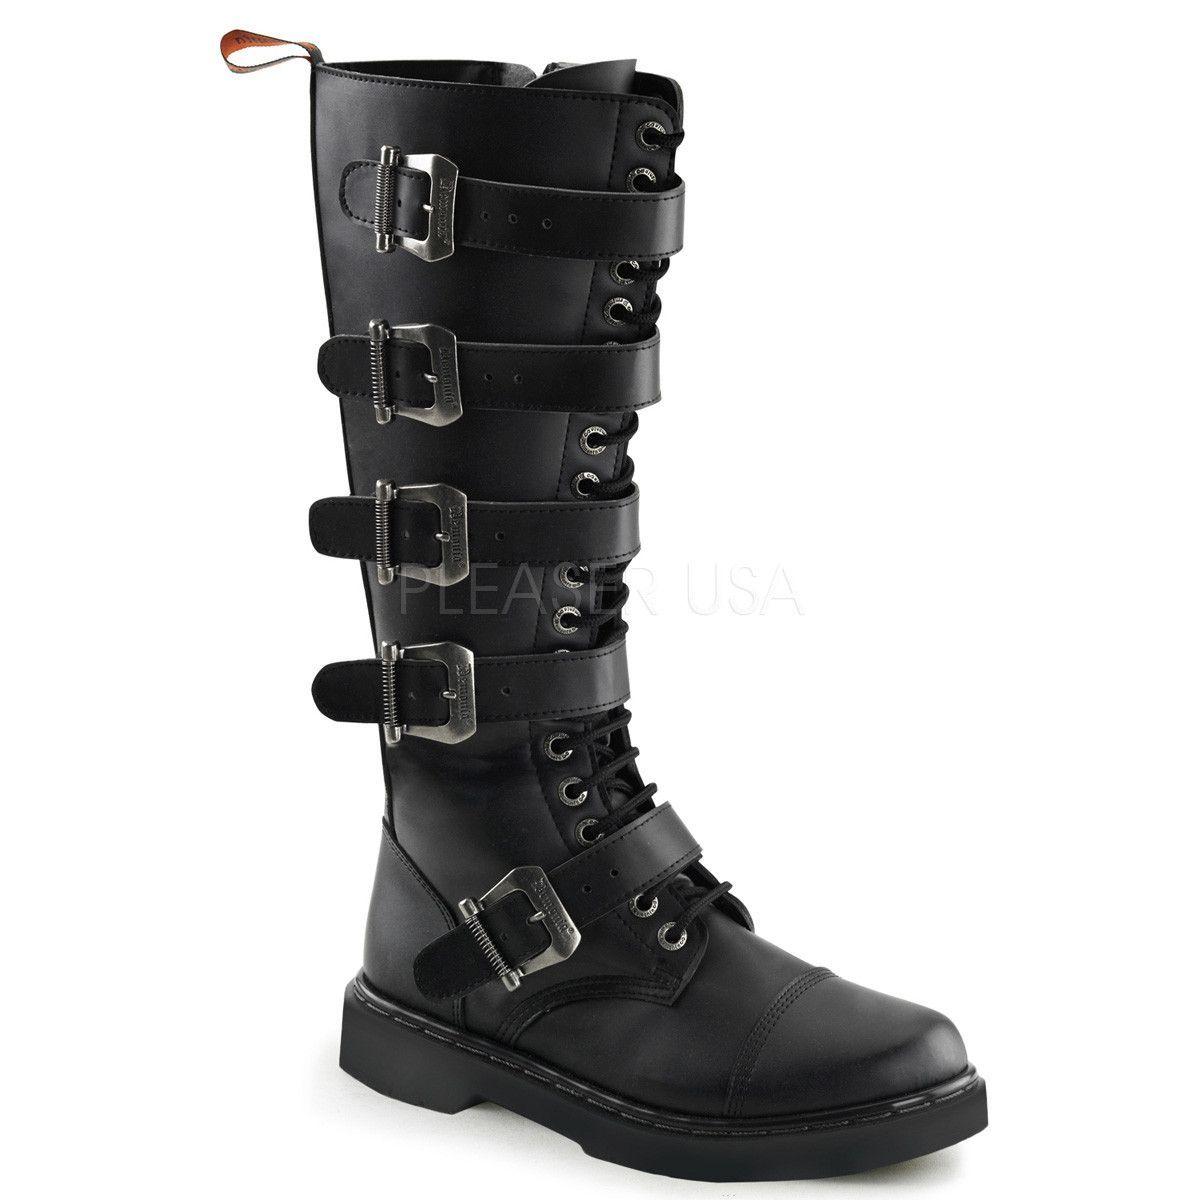 Demonia Men's DEFIANT-420 Men's Black Vegan Leather Goth Punk Combat Boots